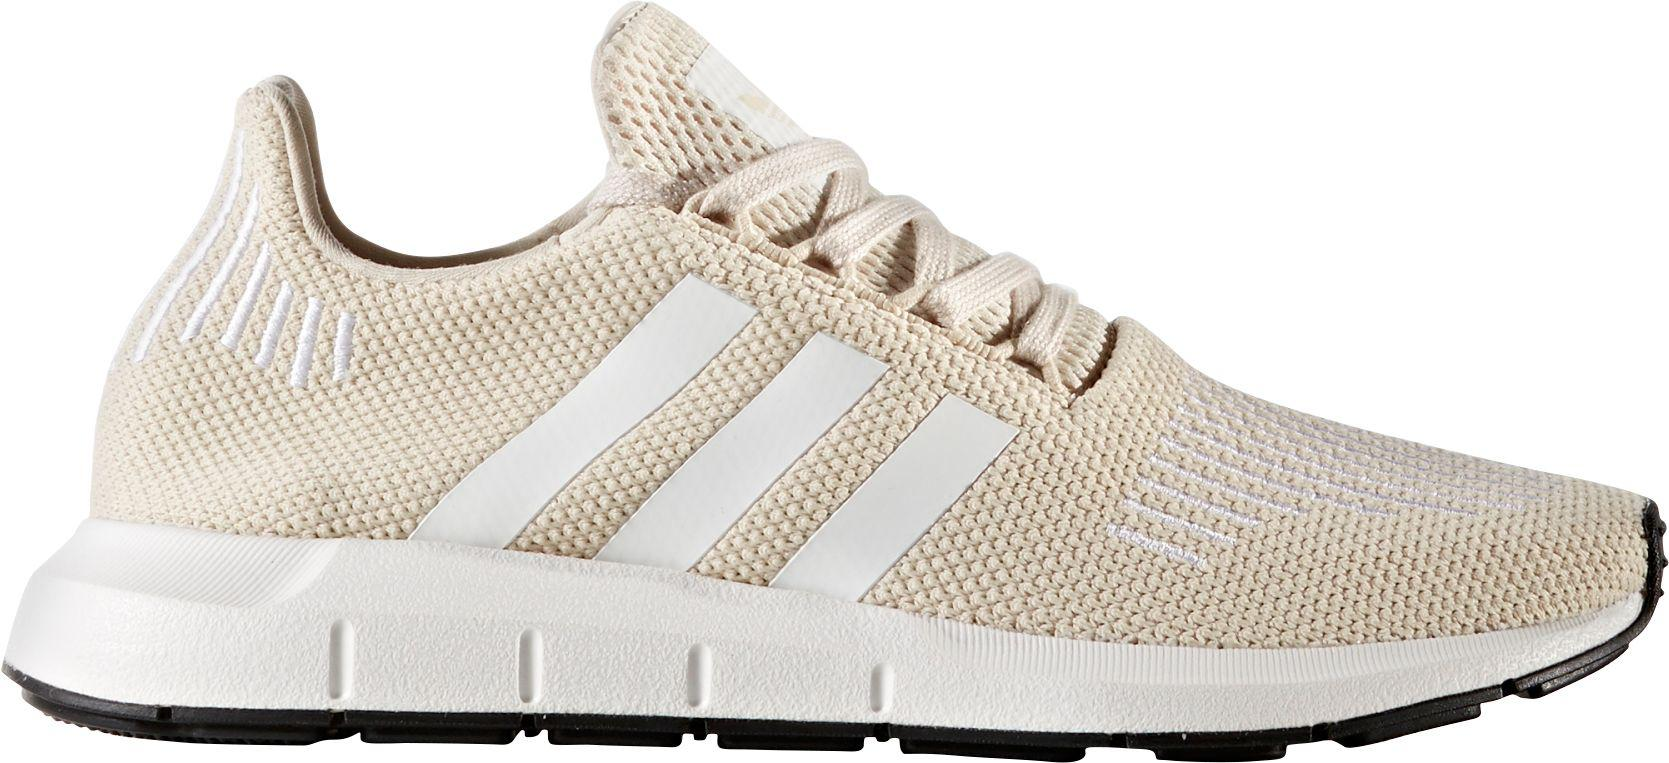 eb05b76fce17 Adidas Originals - Multicolor Swift Run Running Shoes - Lyst